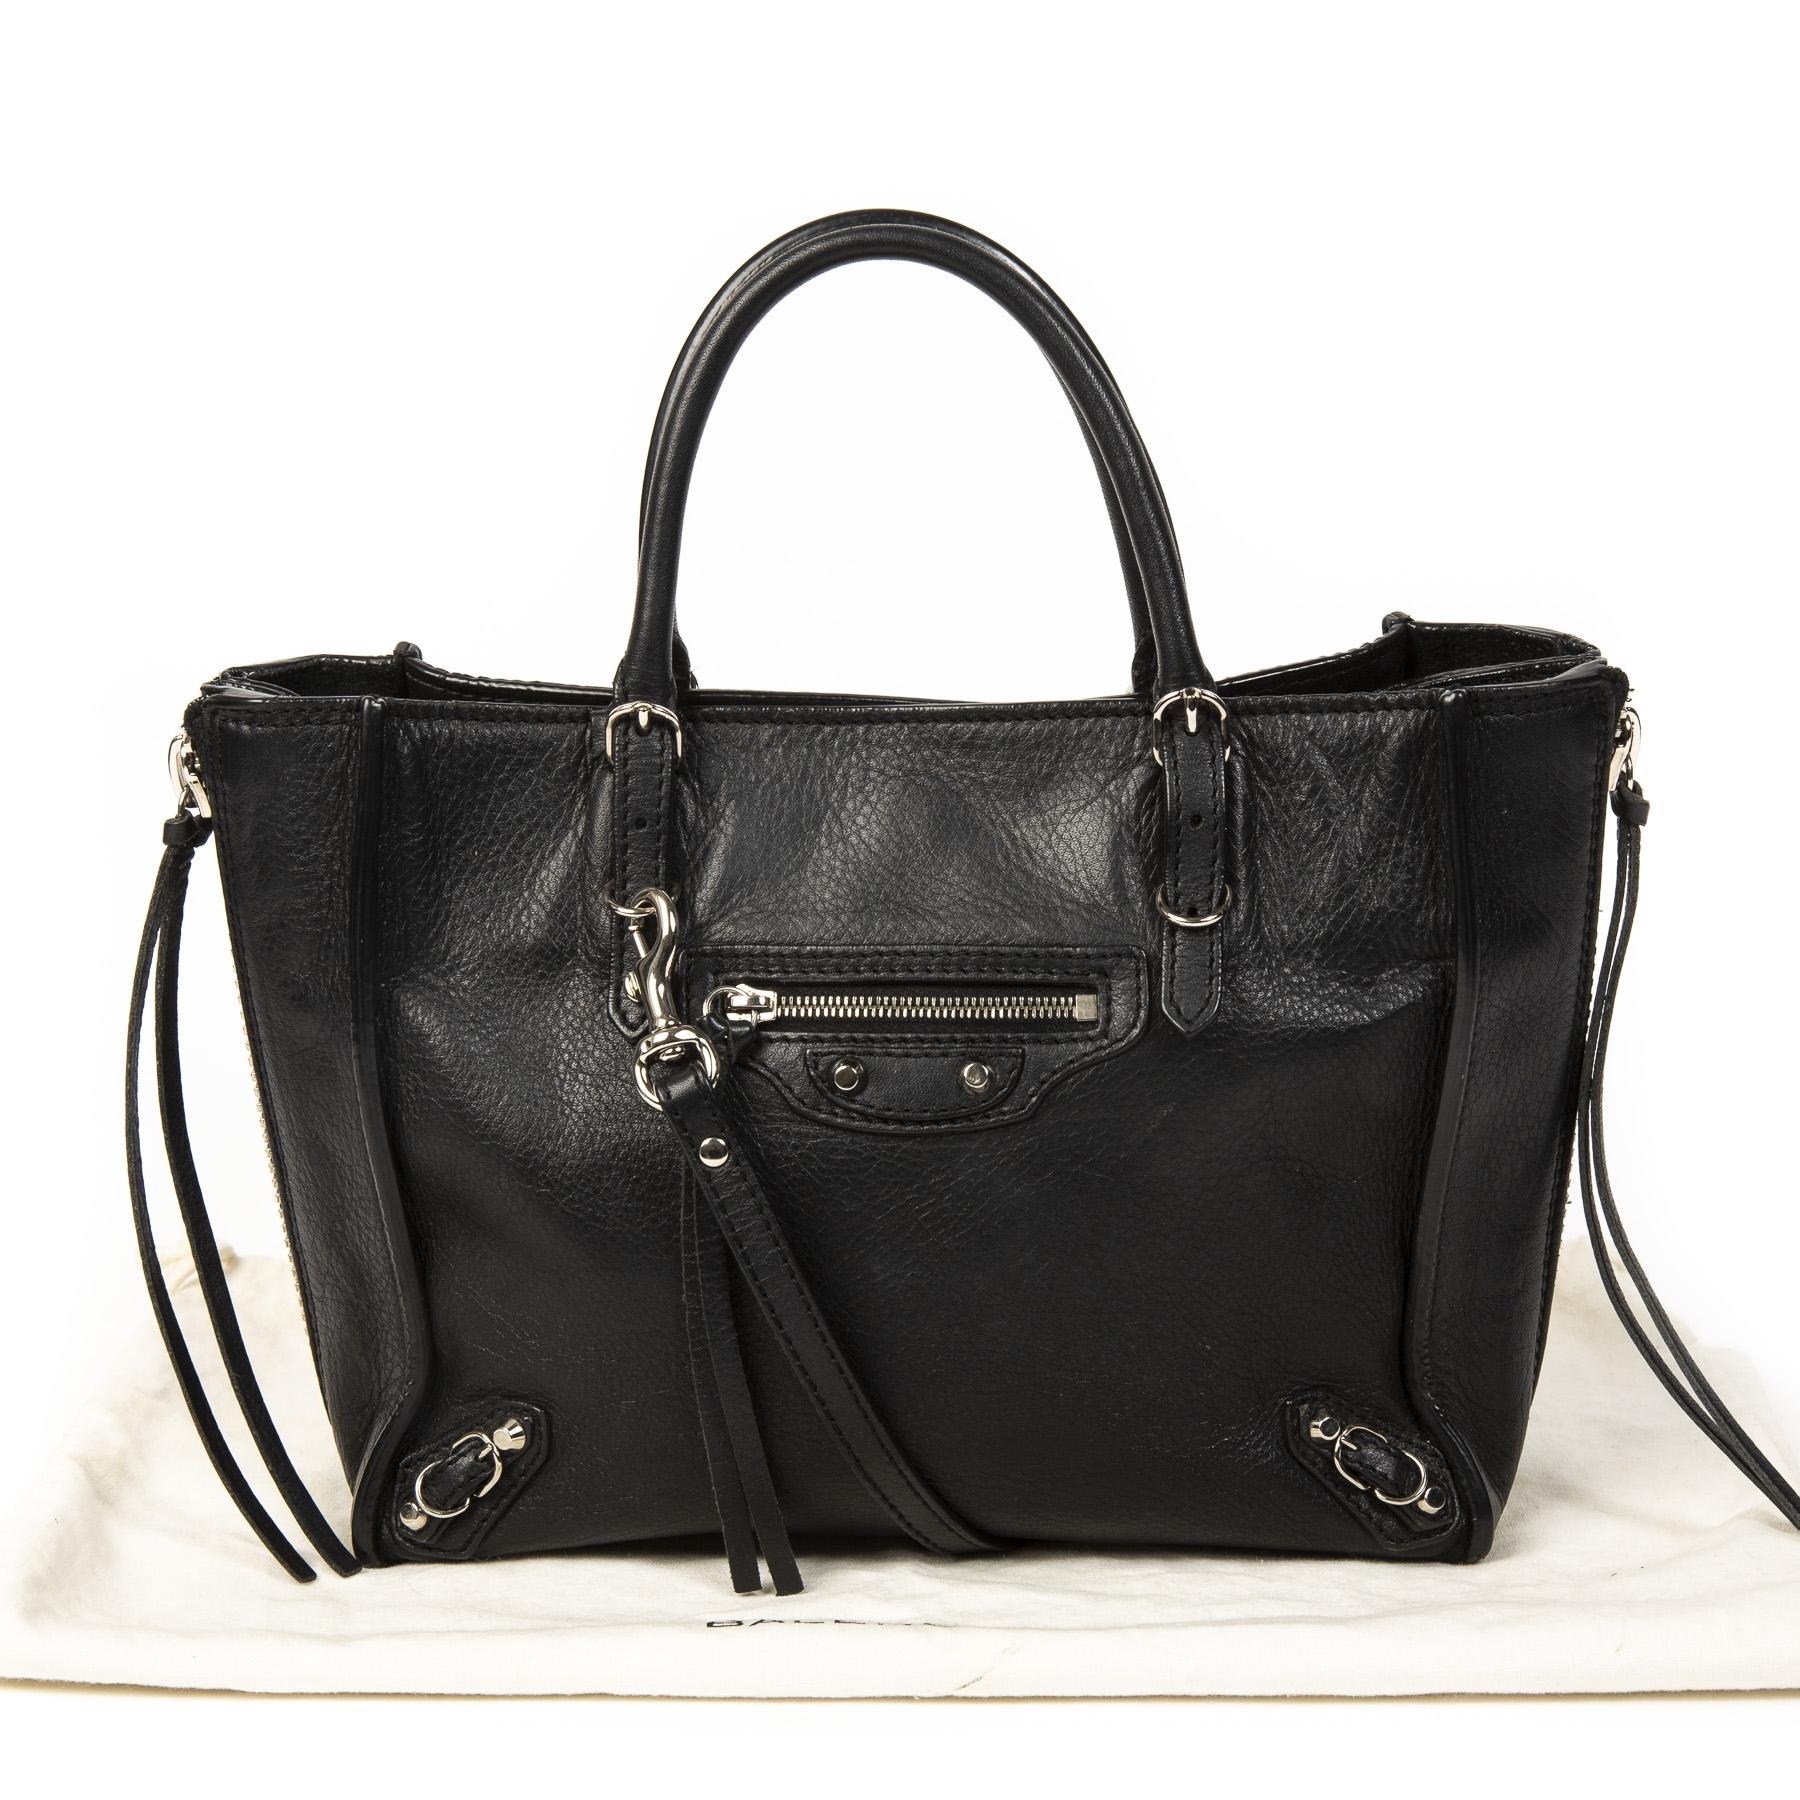 Balenciaga Black Papier Mini A4 Zip Around. Buy authentic secondhand Balenciaga bag at labellov antwerp, safe payment. Koop online tweedehands balenciaga papier tas bij labellov antwerpen. Veilige betaling. Designer vintage.